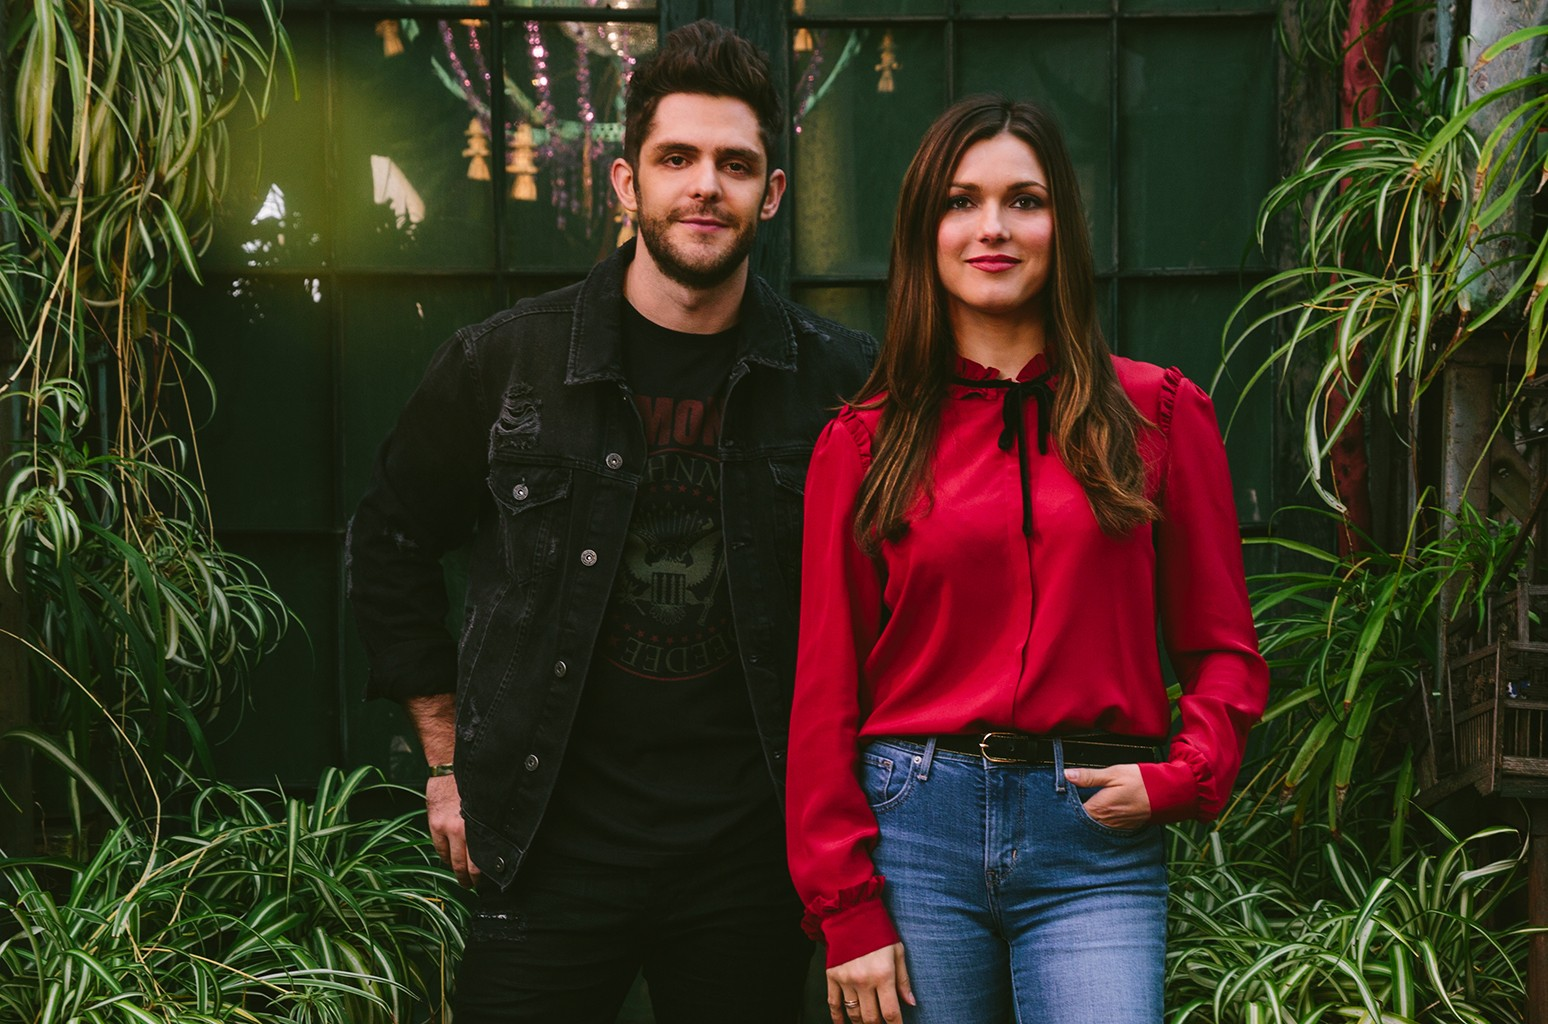 Thomas Rhett and Virginia Davis